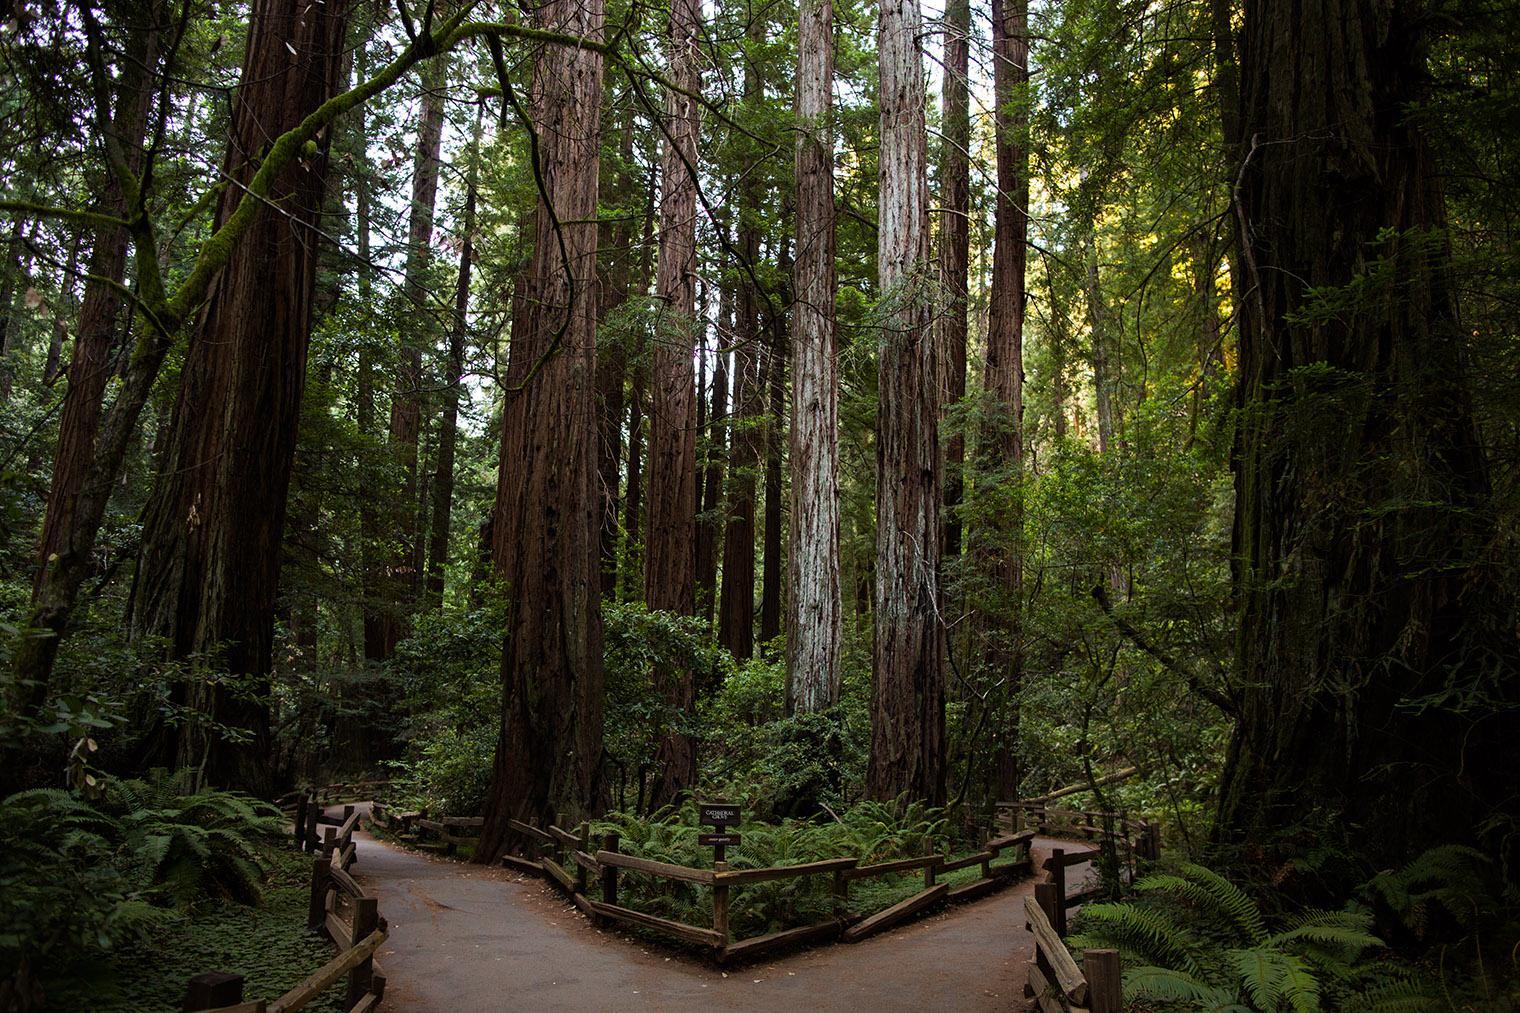 Proposal at Muir Woods